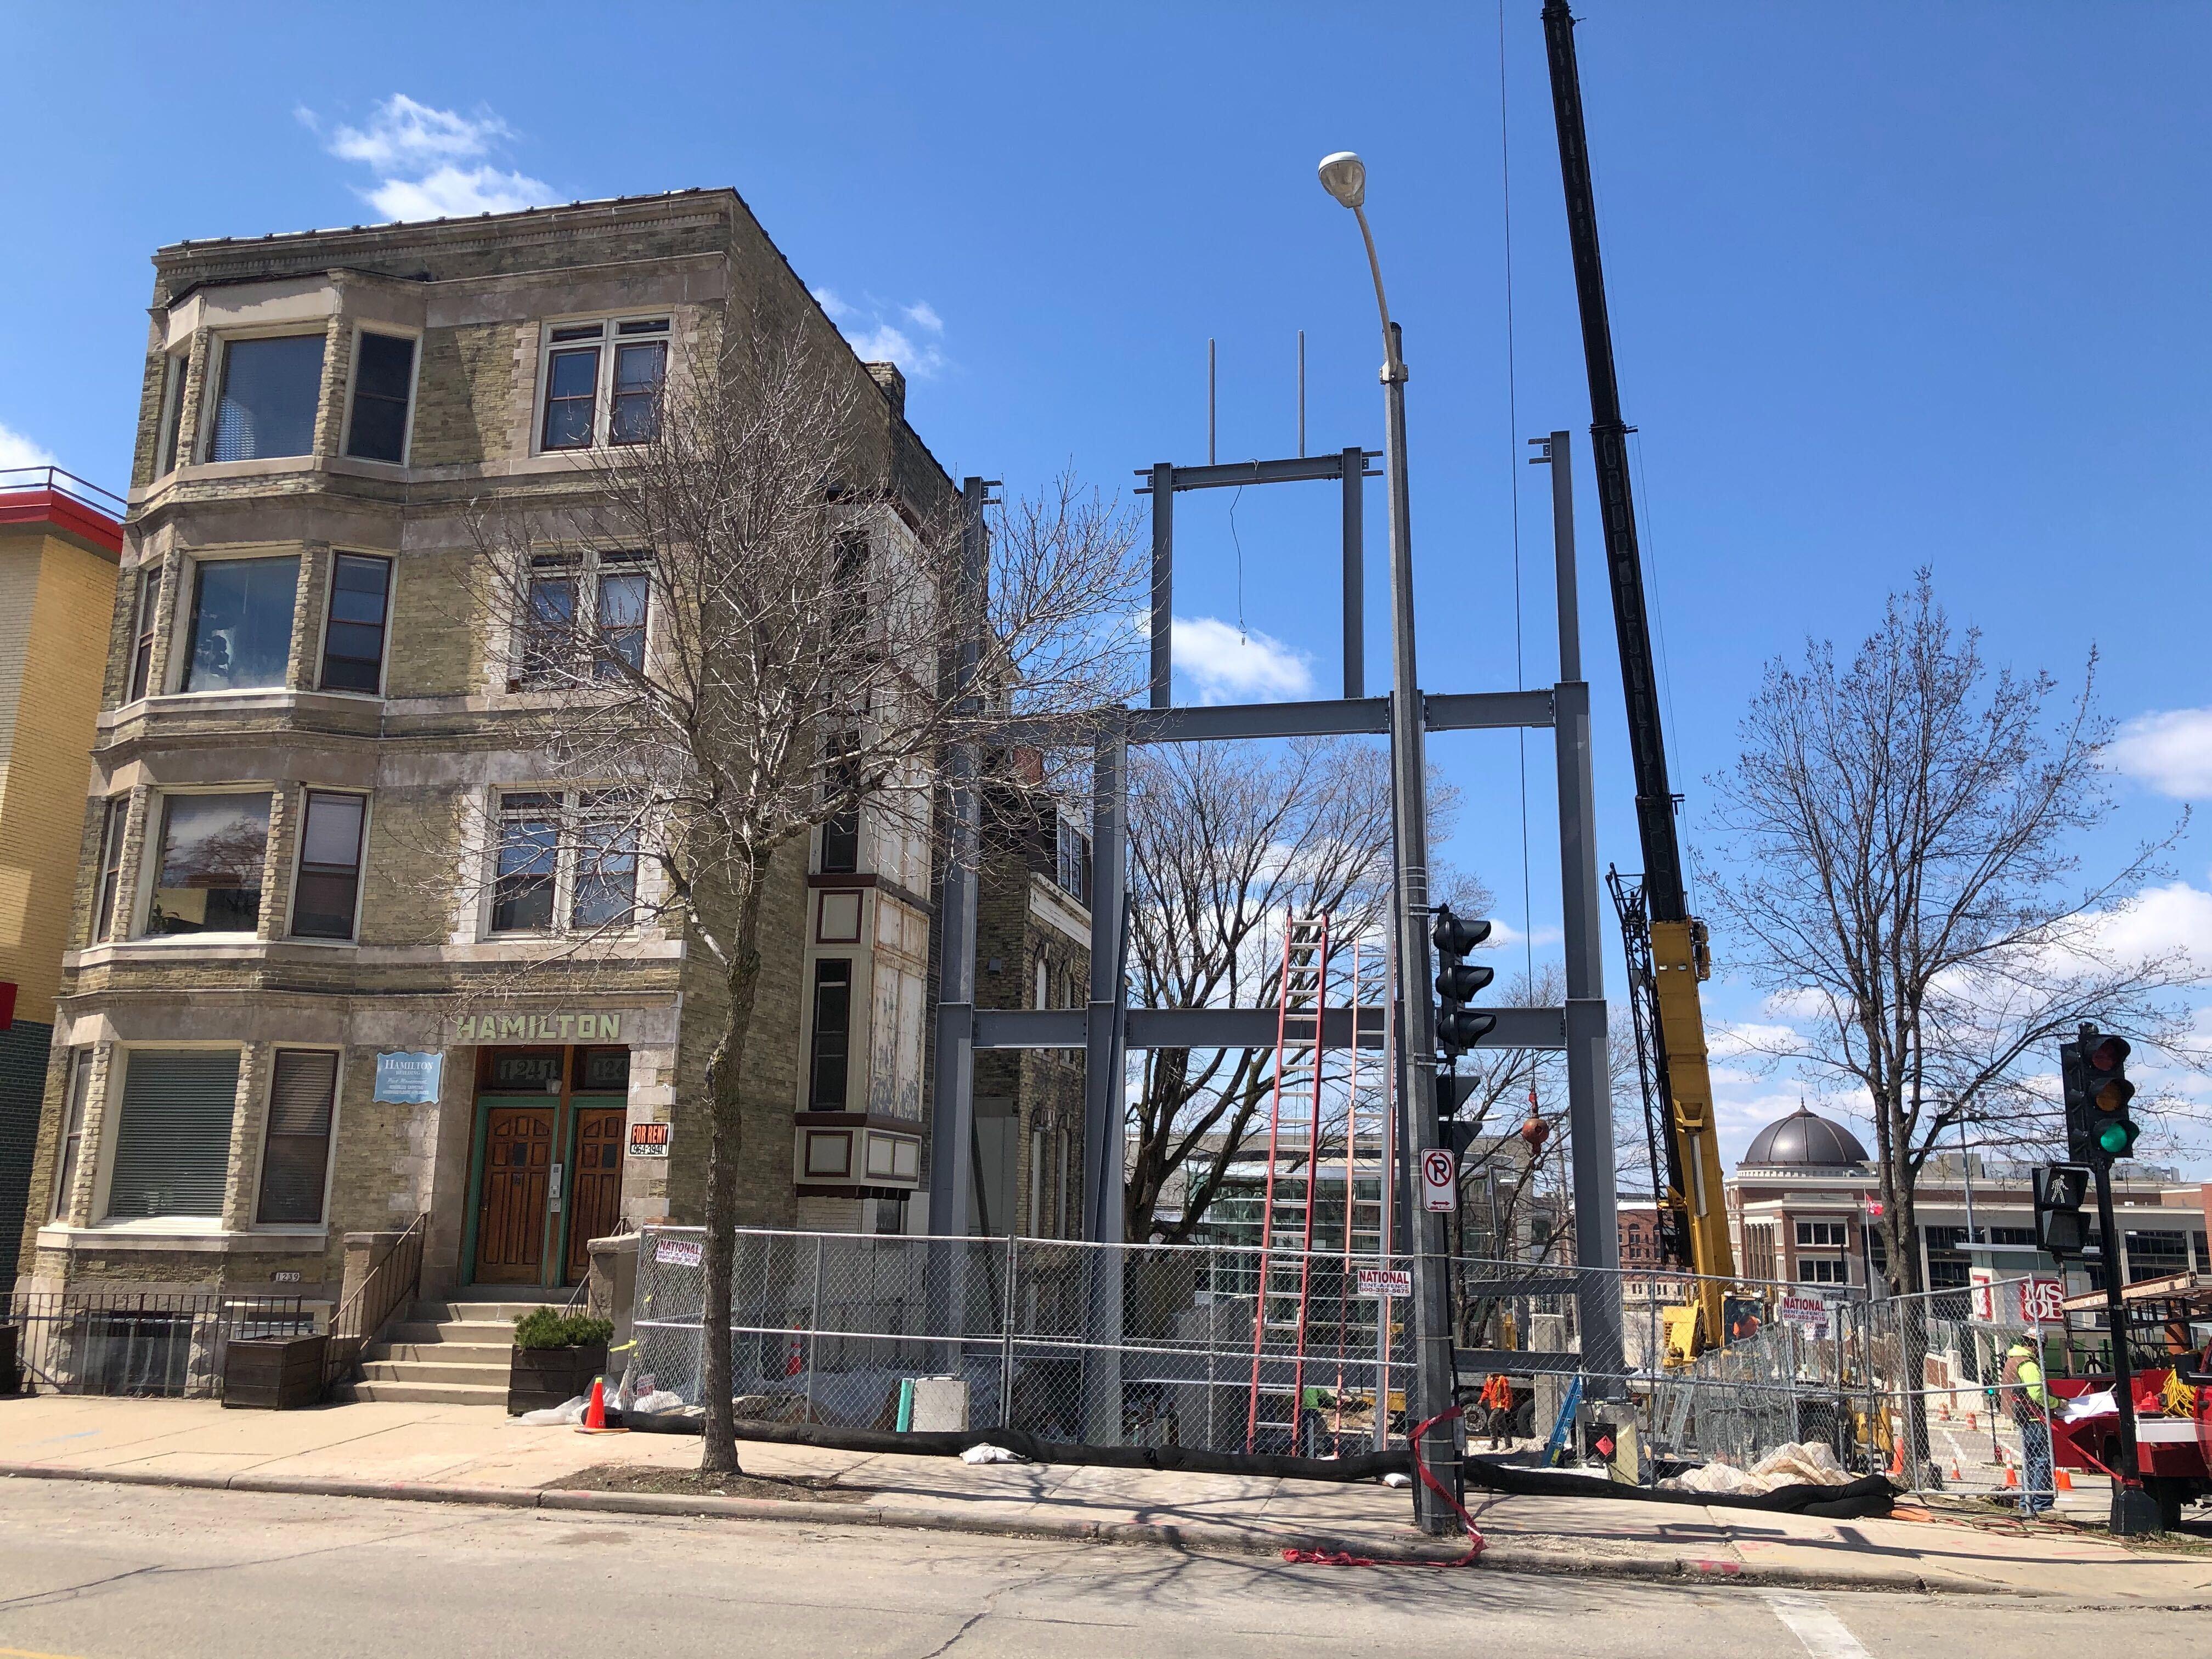 1245-1247 N. Milwaukee St. apartment building construction. Photo by Jeramey Jannene.